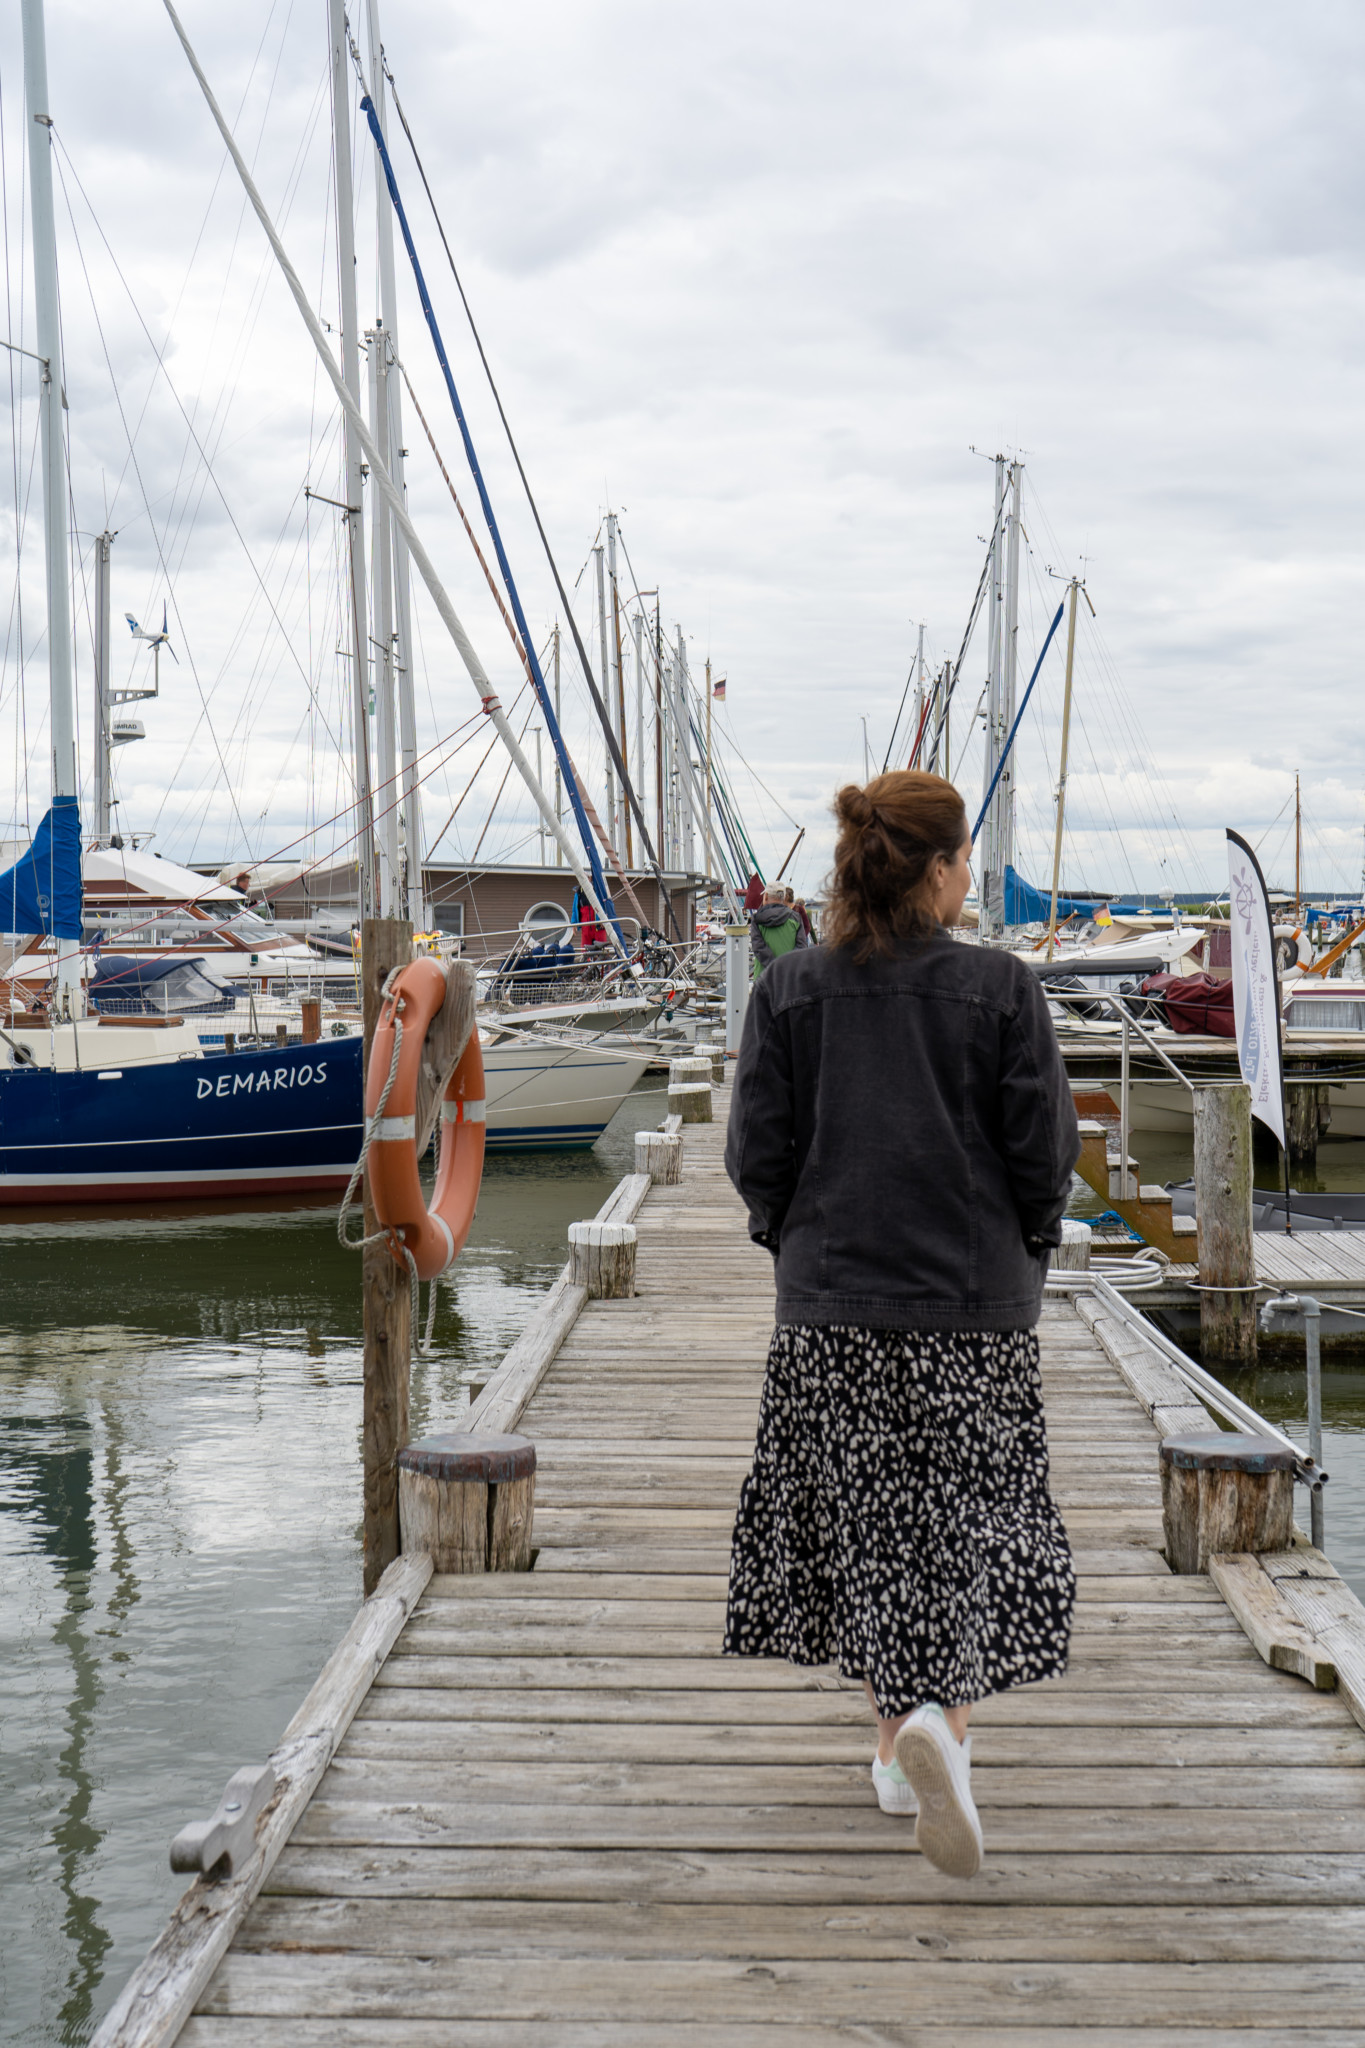 Naturhafen Kamminke auf Usedom